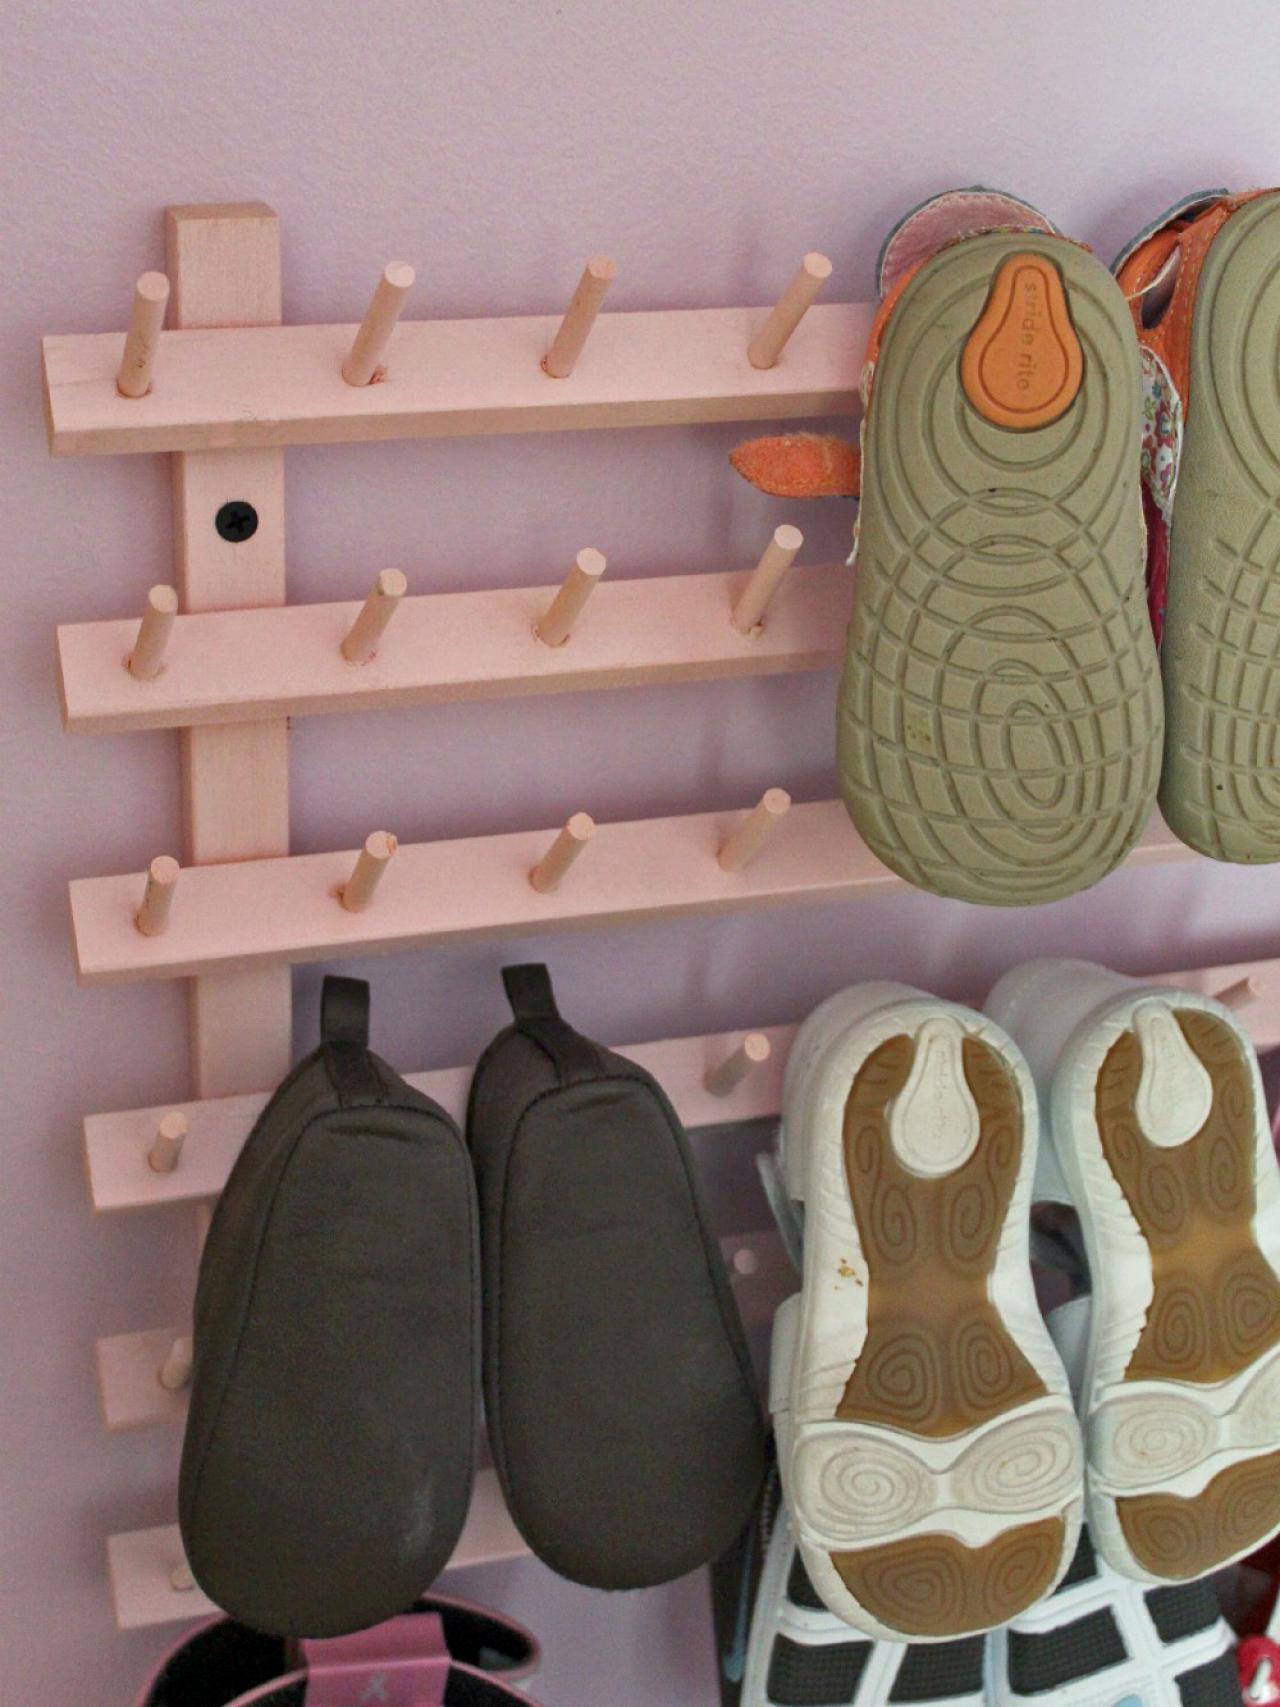 Original_Amanda-Hervey-baby-shoe-rack_s3x4.jpg.rend.hgtvcom.1280.1707